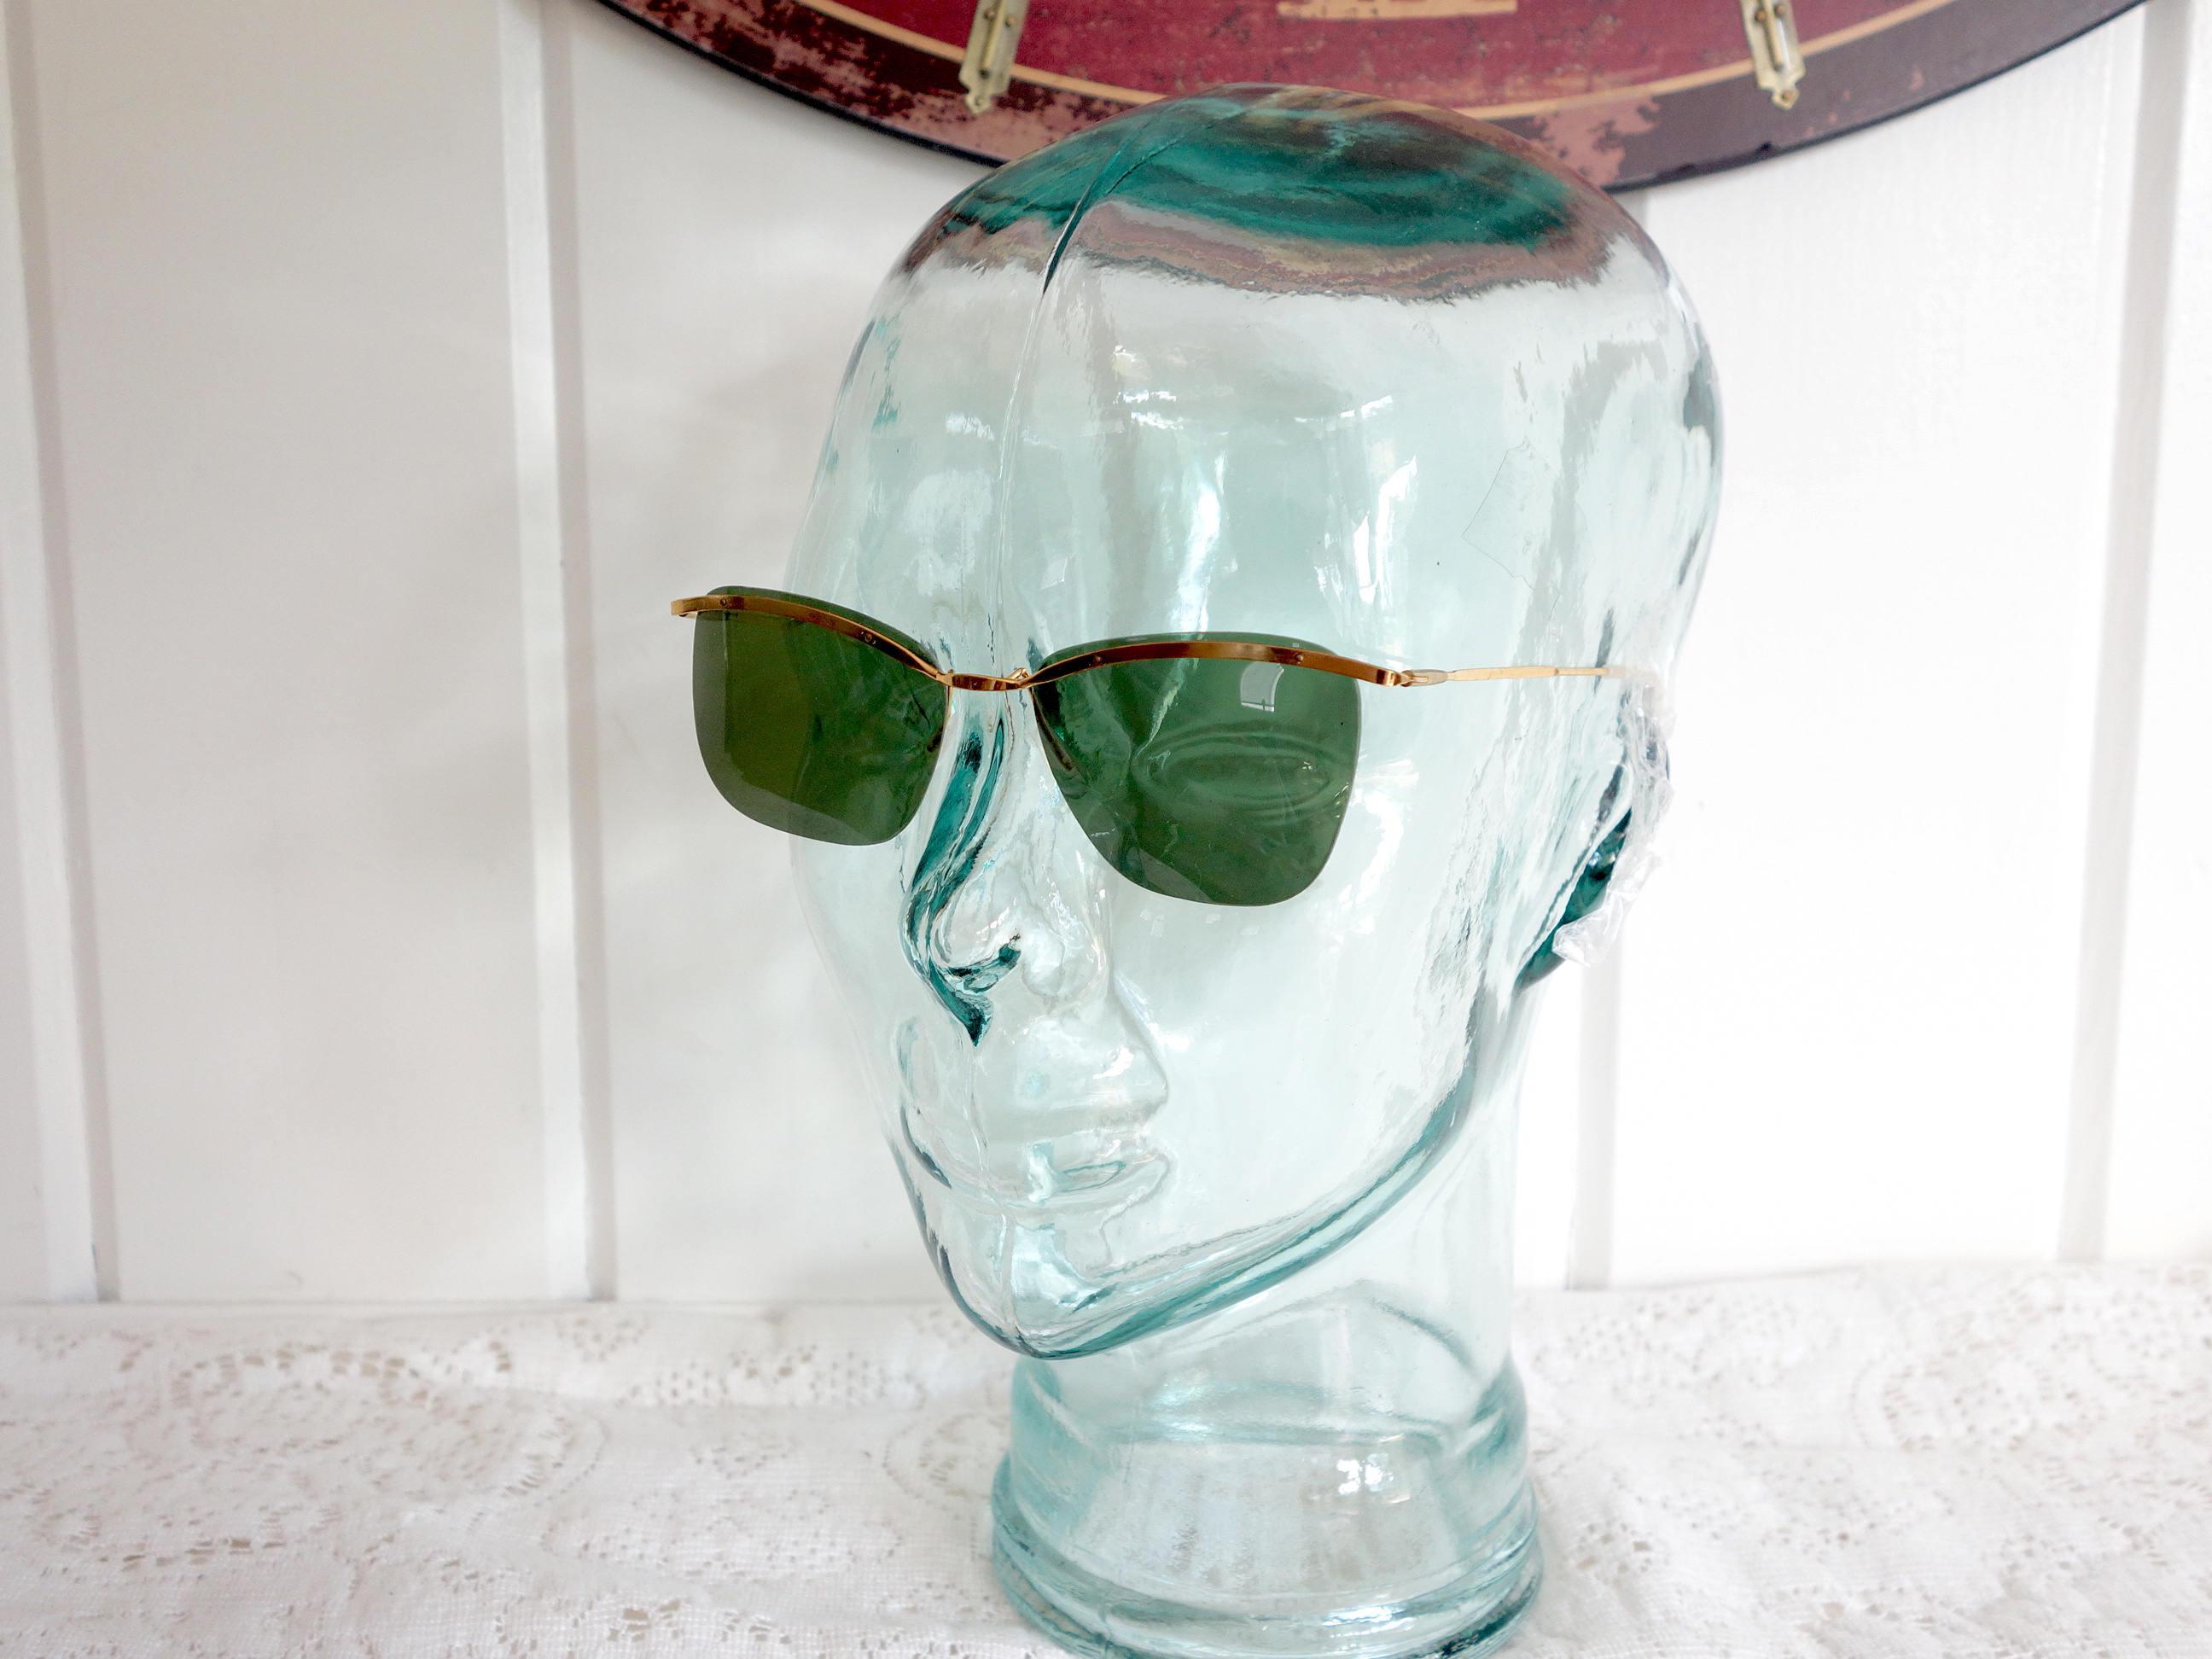 Vintage Rimless 1960s Green Lenses Gold Metal Frames Sunglasses New ...